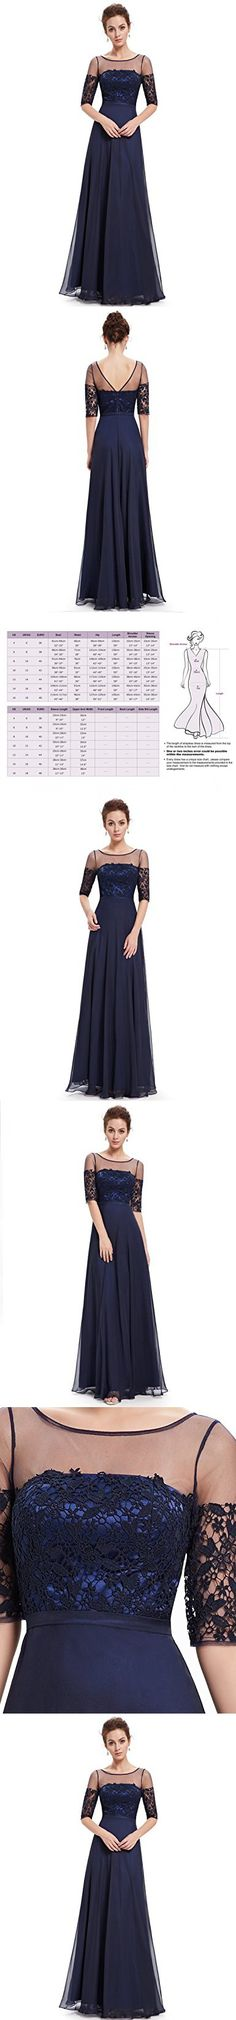 3c6c3bd53ce Ever Pretty Womens Floor Length Sexy Illucion Neckline Prom Dress 16 US  Navy Blue